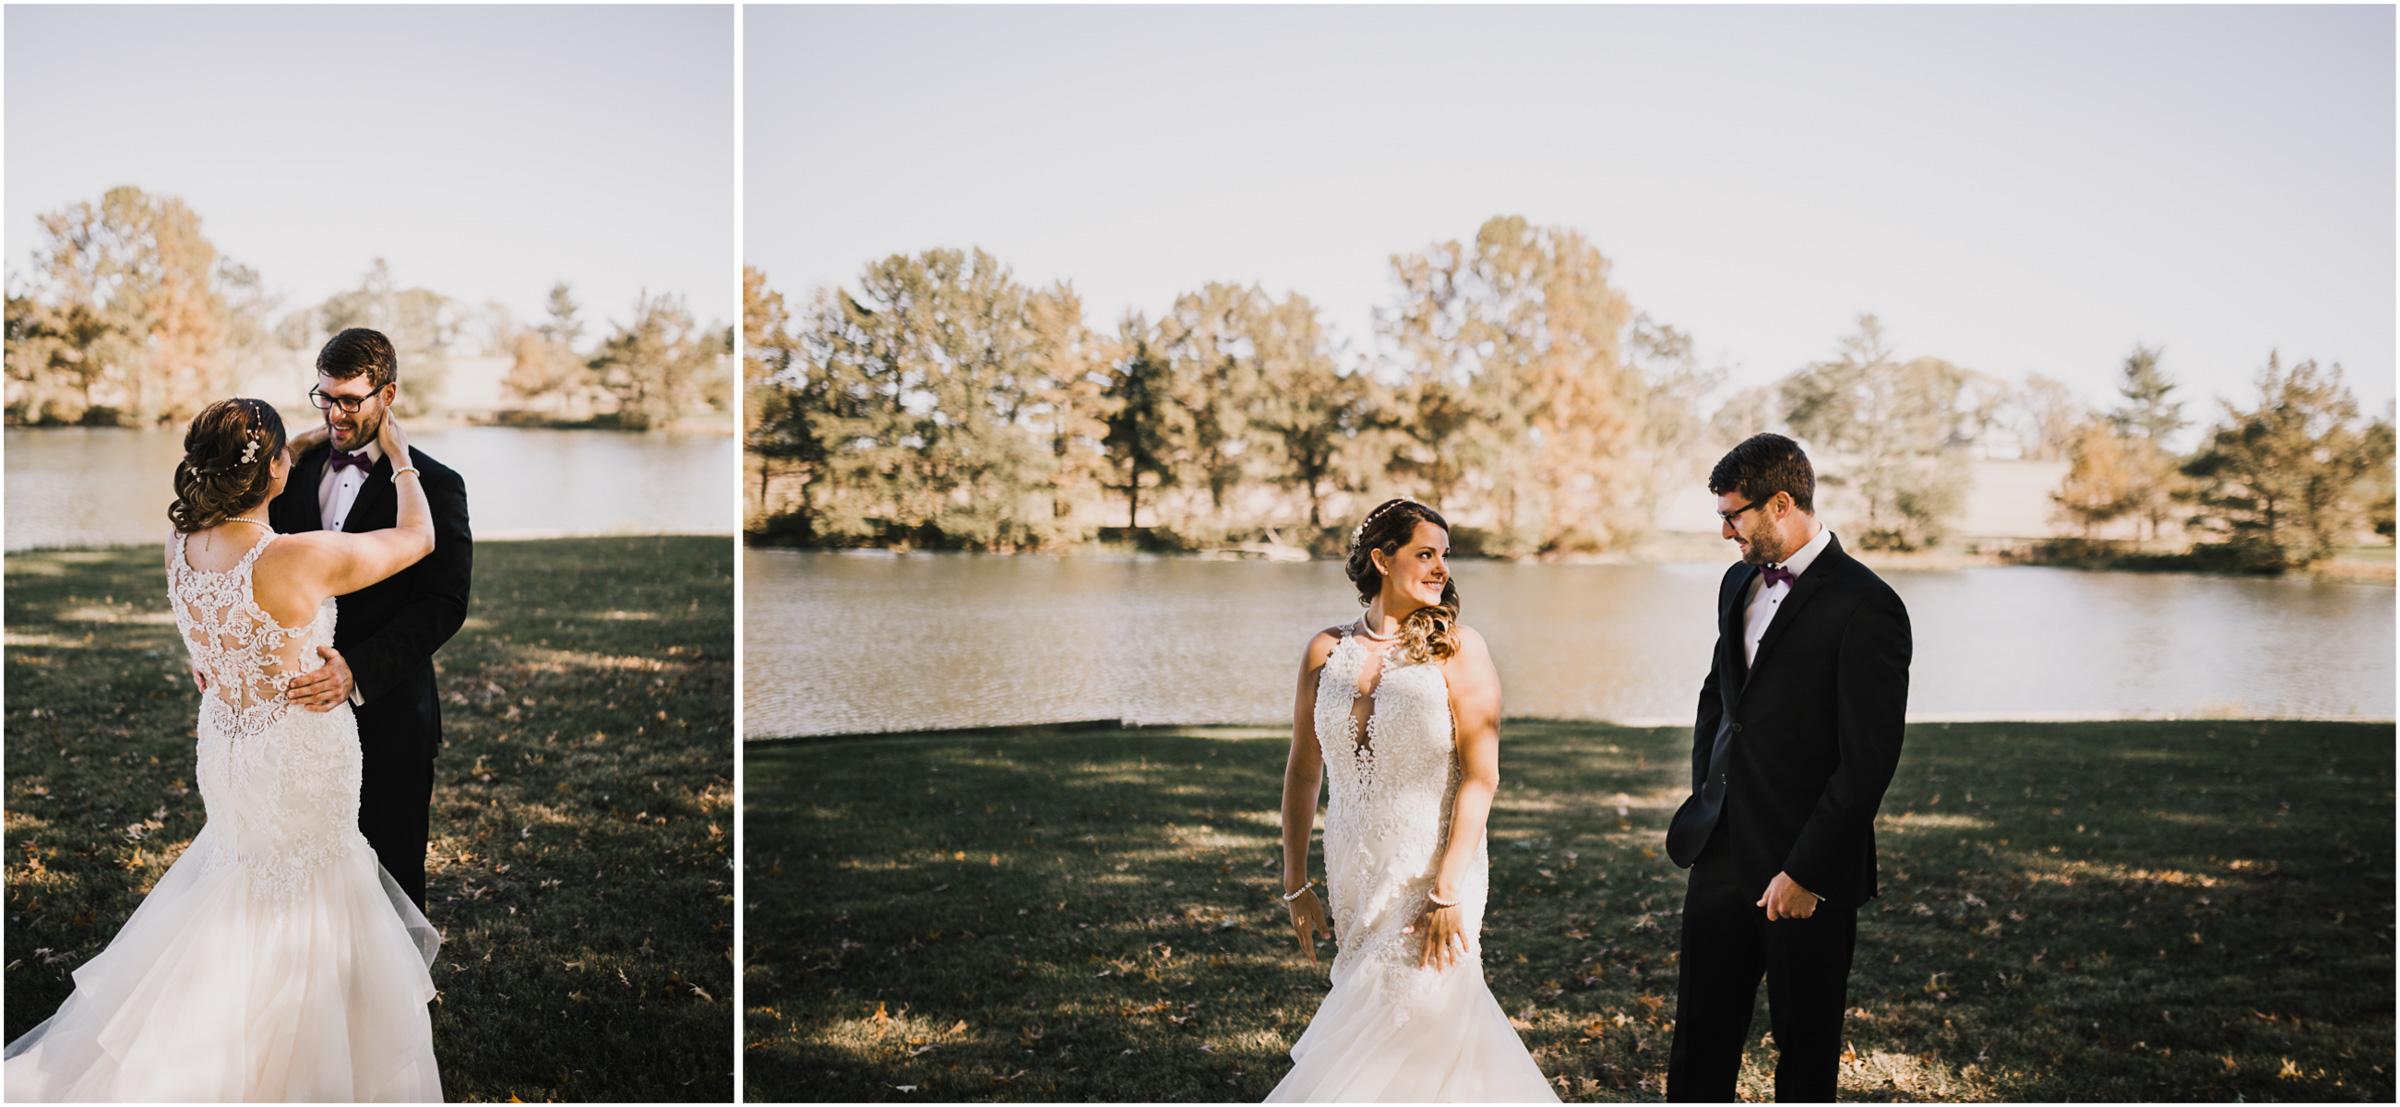 alyssa barletter photography intimate fall autumn wedding rural missouri wedding photographer-8.jpg